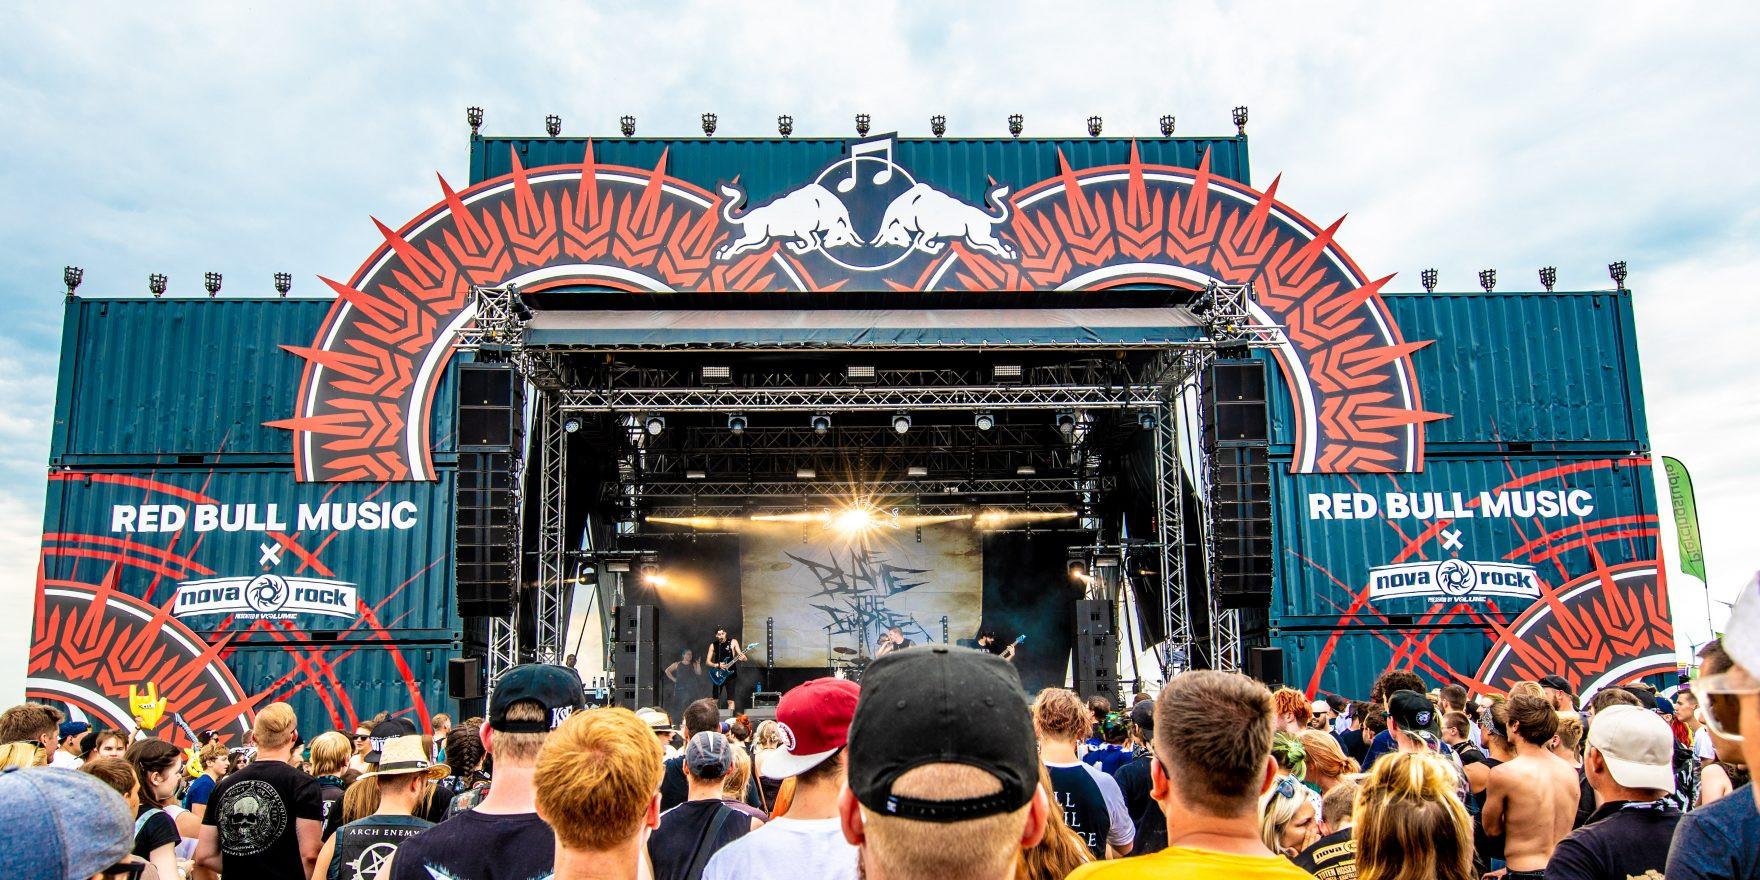 Nova Rock 2019: Red Bull Music Stage